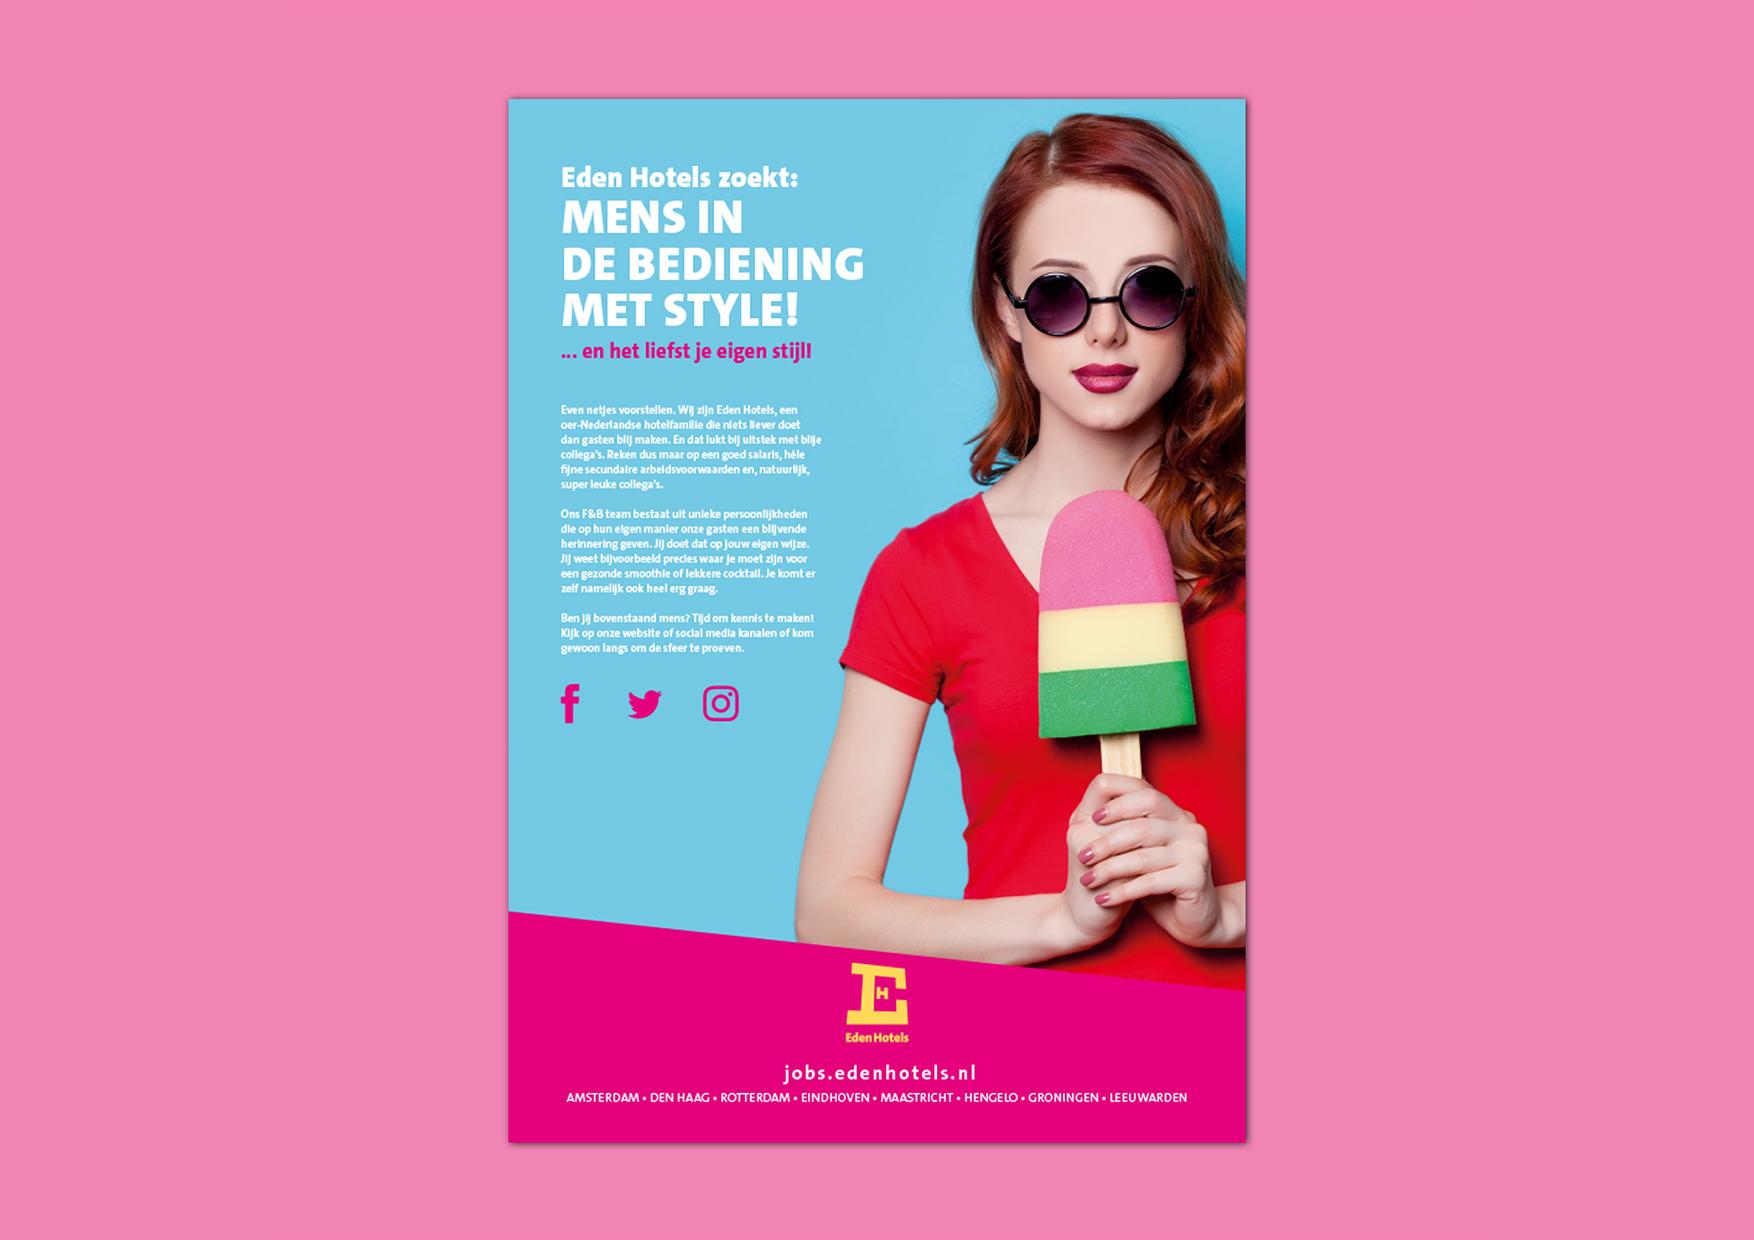 Eden Hotels arbeidsmarktcommunicatie